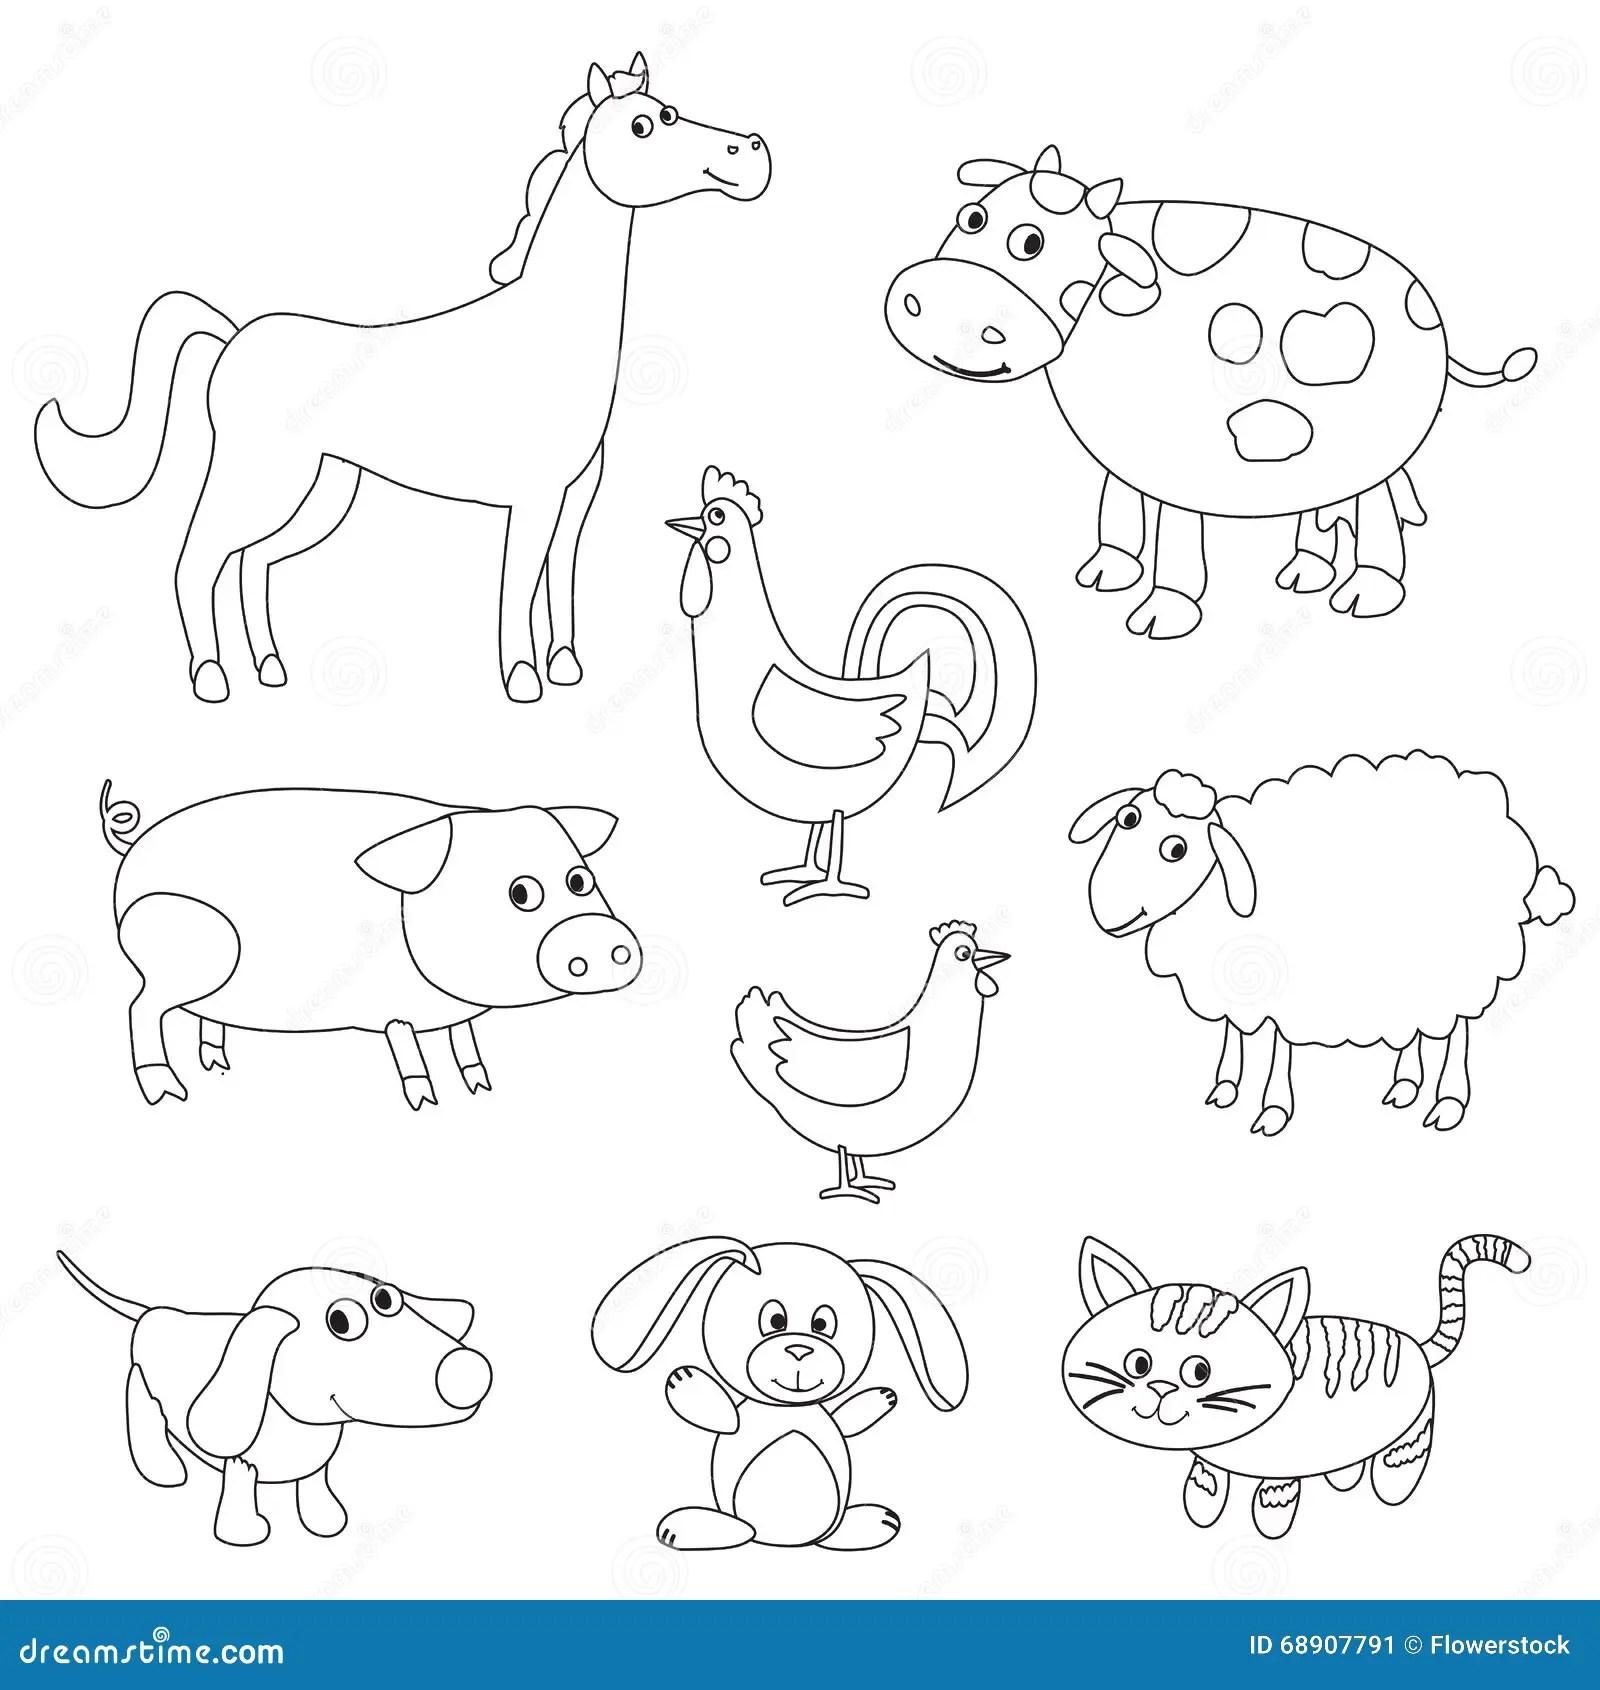 Cute Cartoon Farm Animals And Birds For Coloring Book